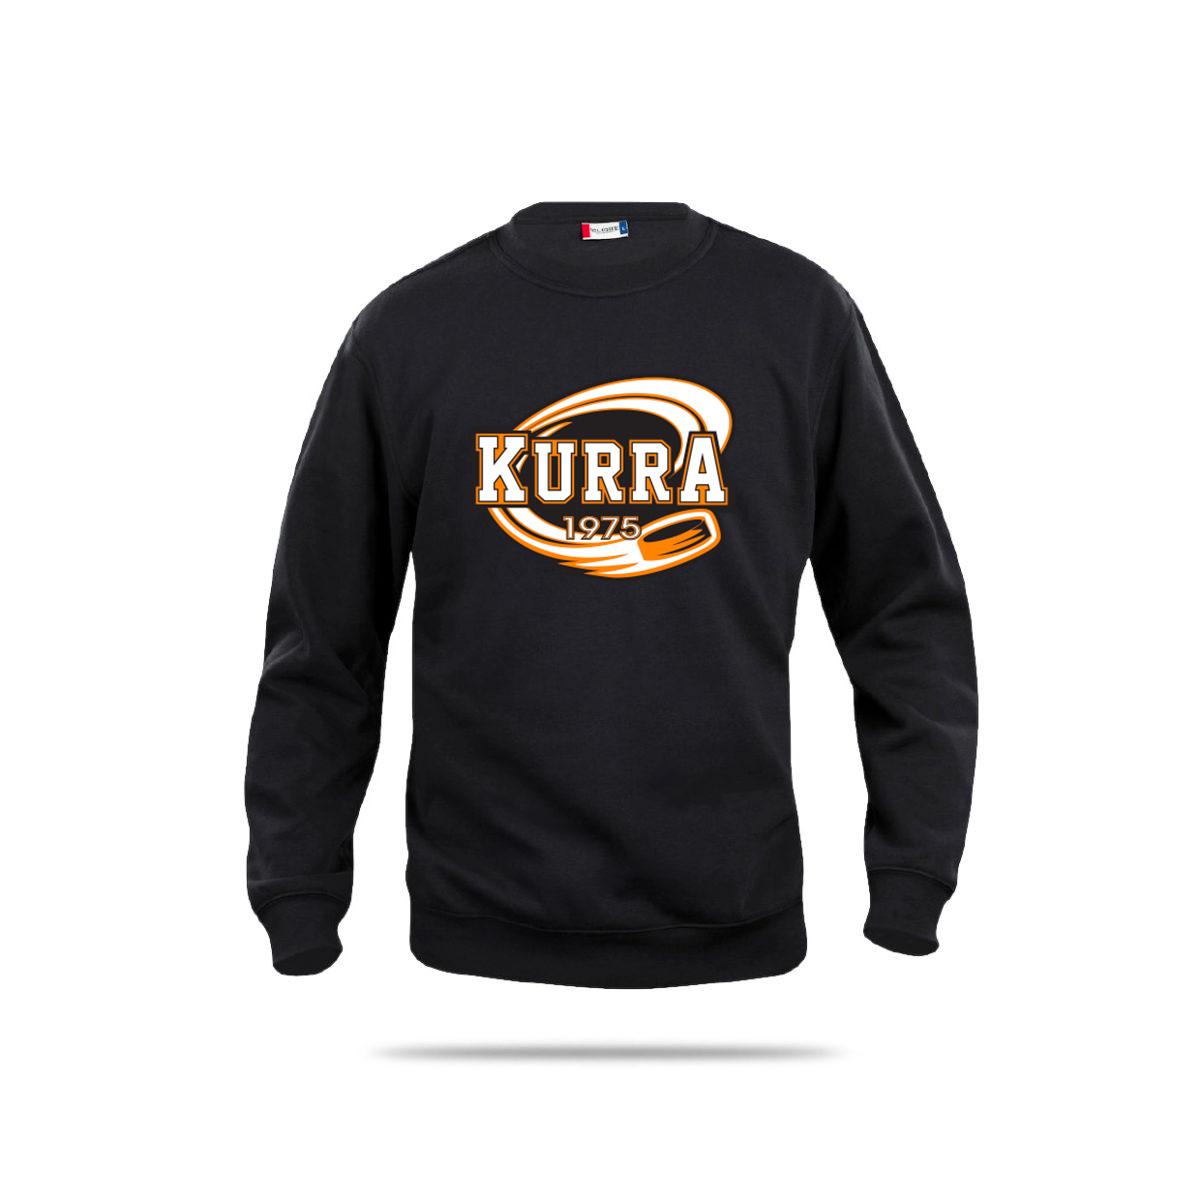 Kurra-Original-3023-musta